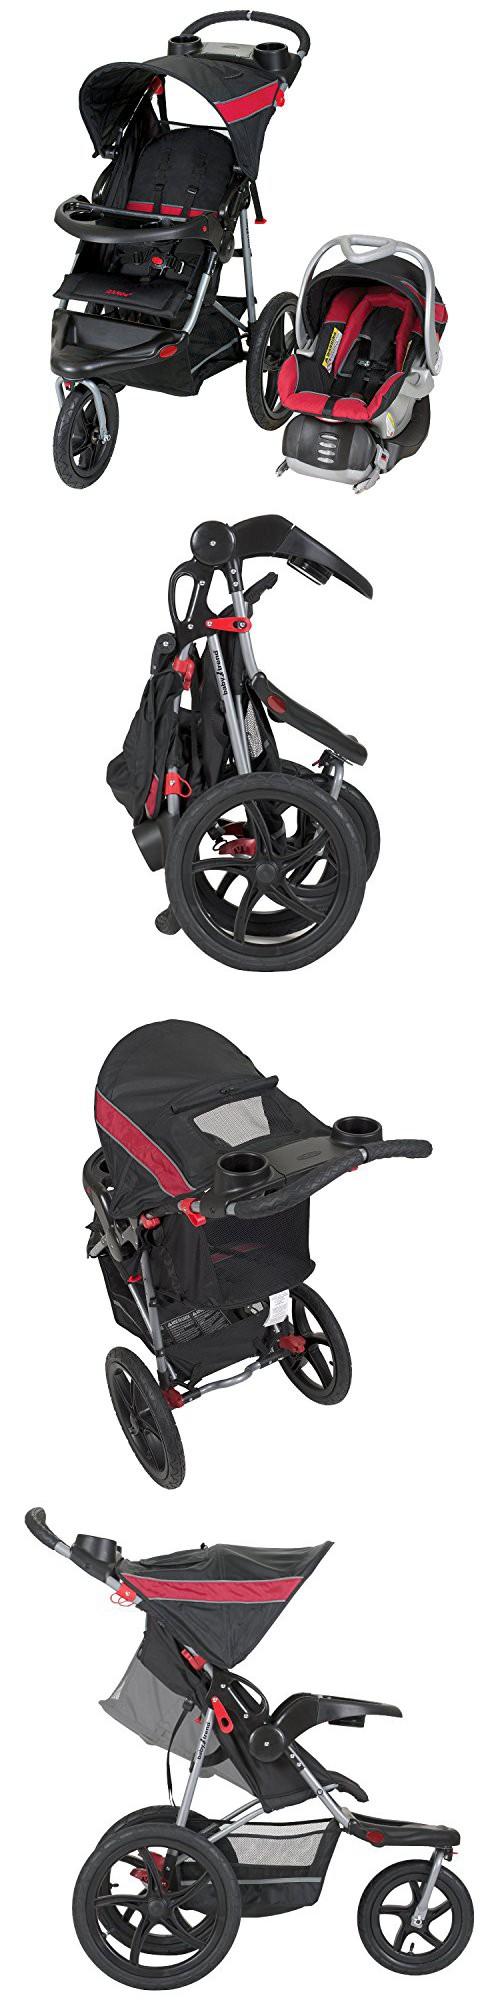 Baby Trend Range Travel System Folding Jogging Stroller Centennial